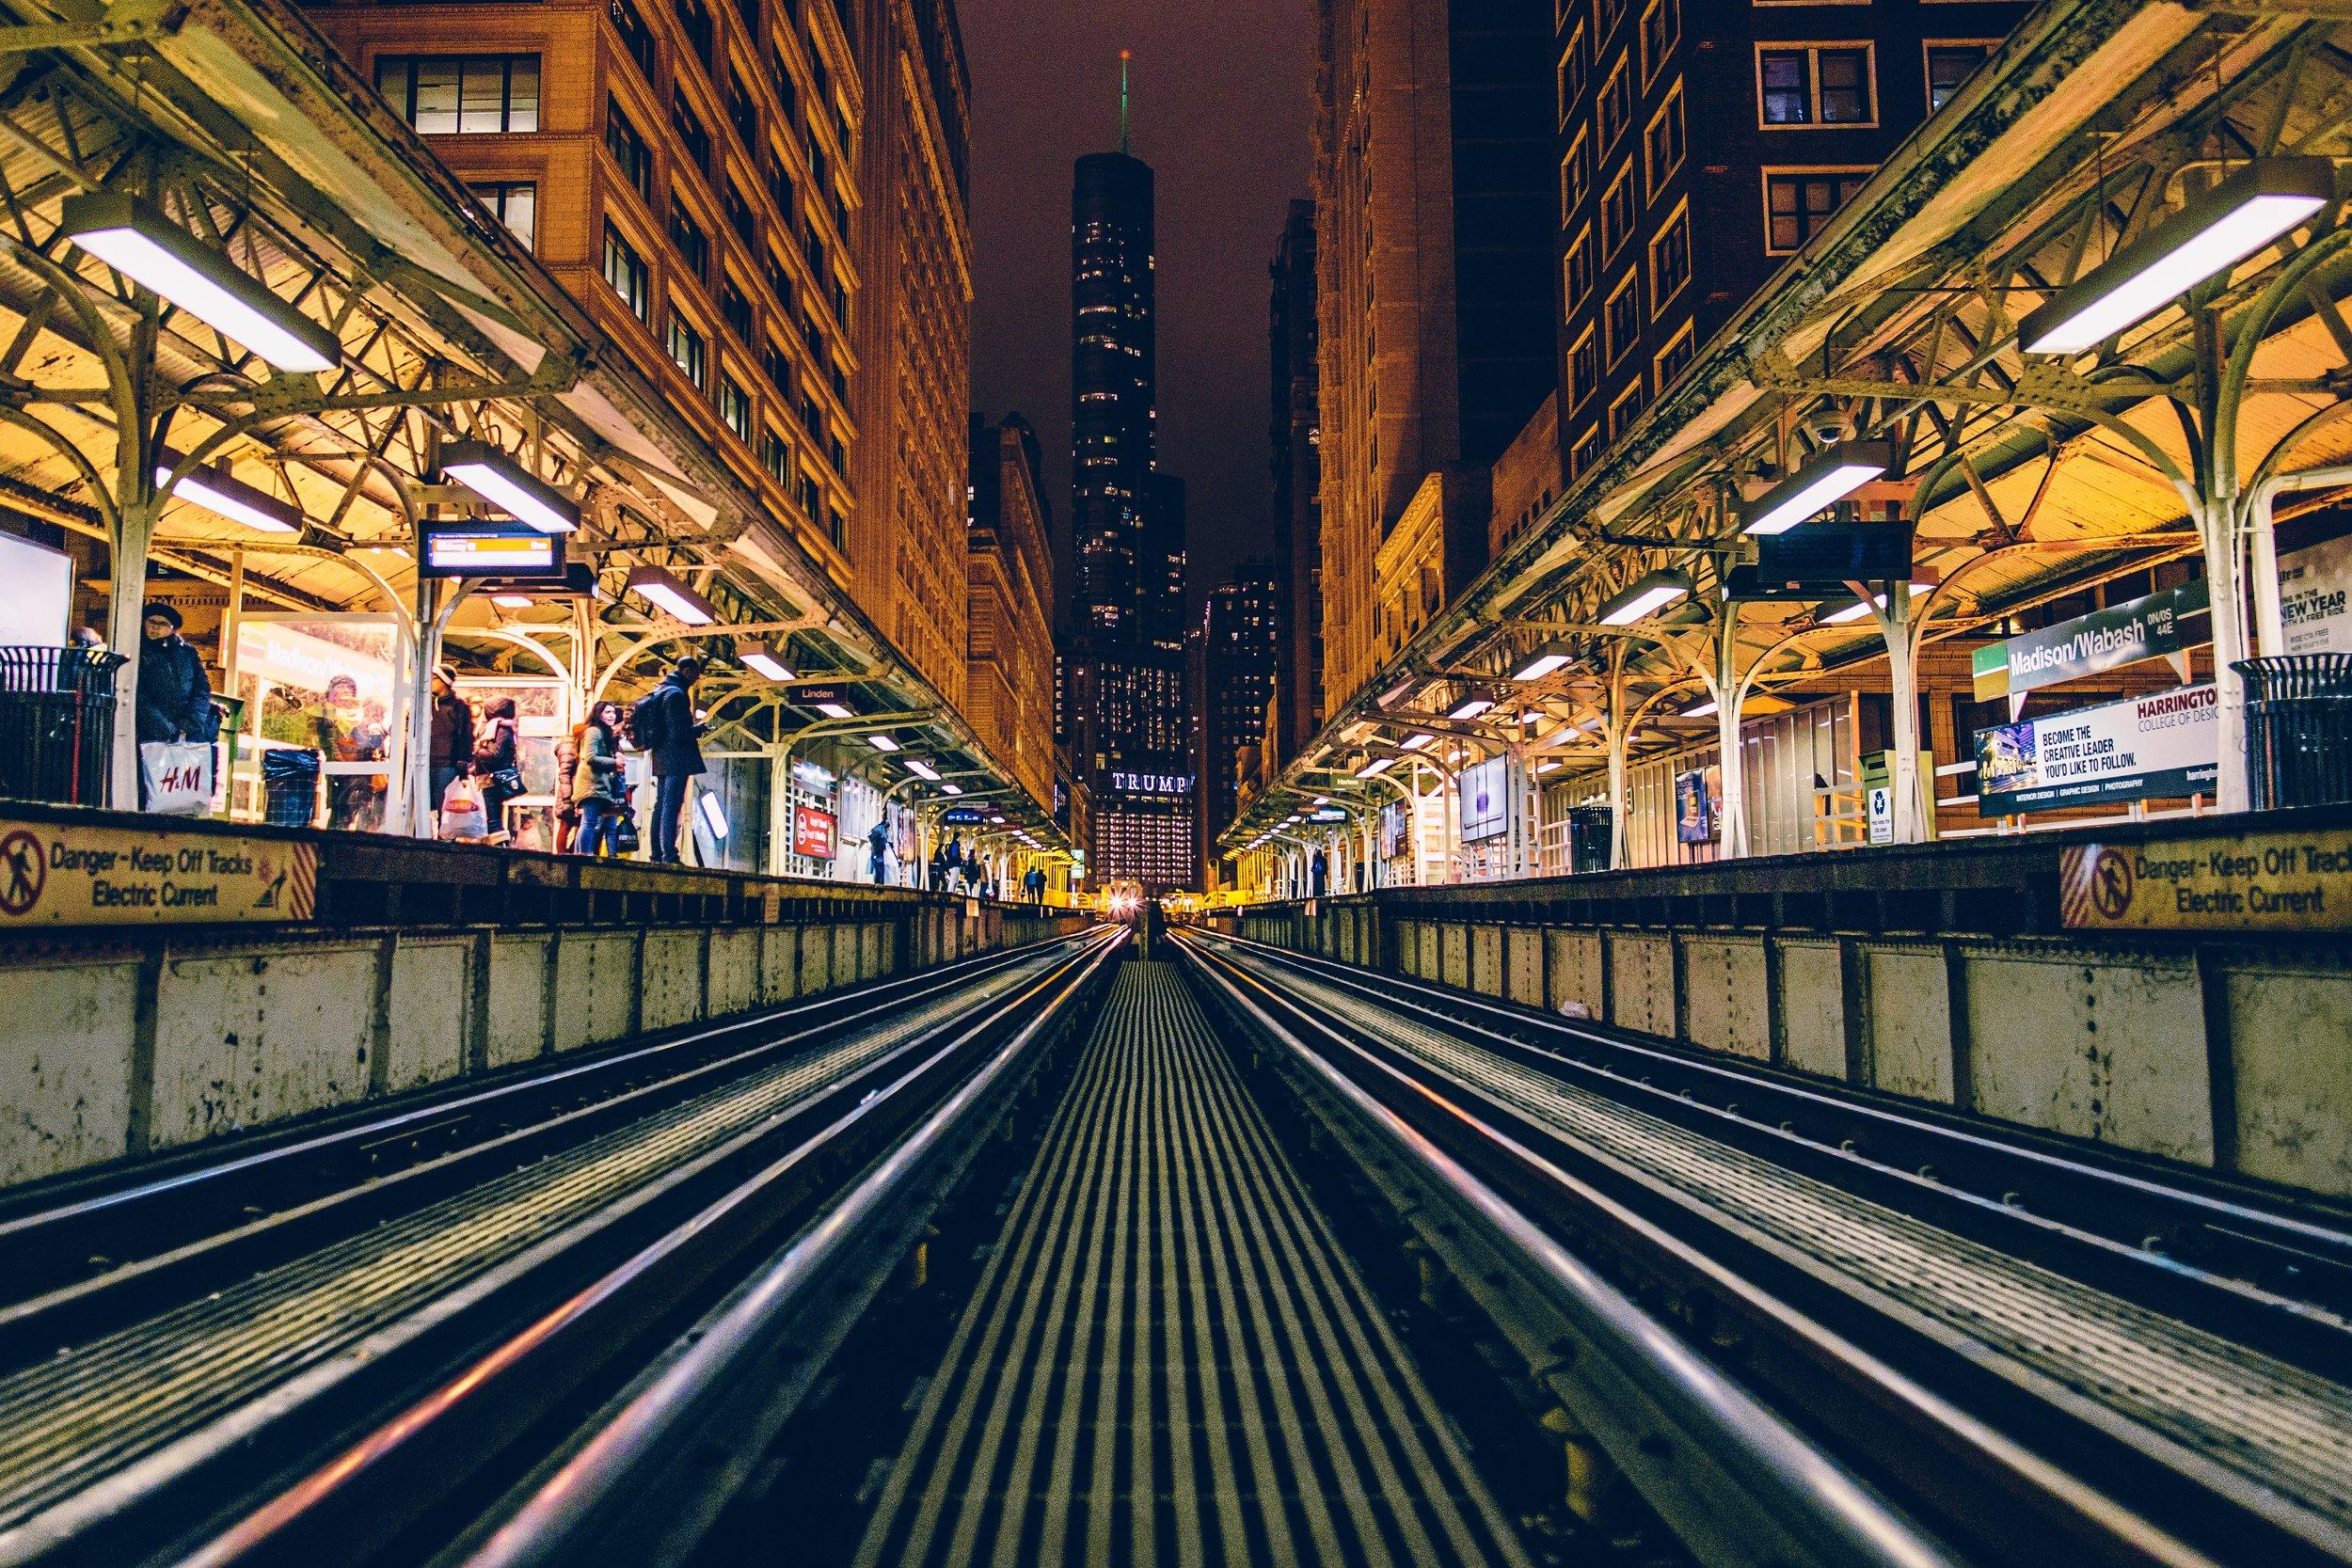 2015-05-30-Chicago 8 copy-1.jpg